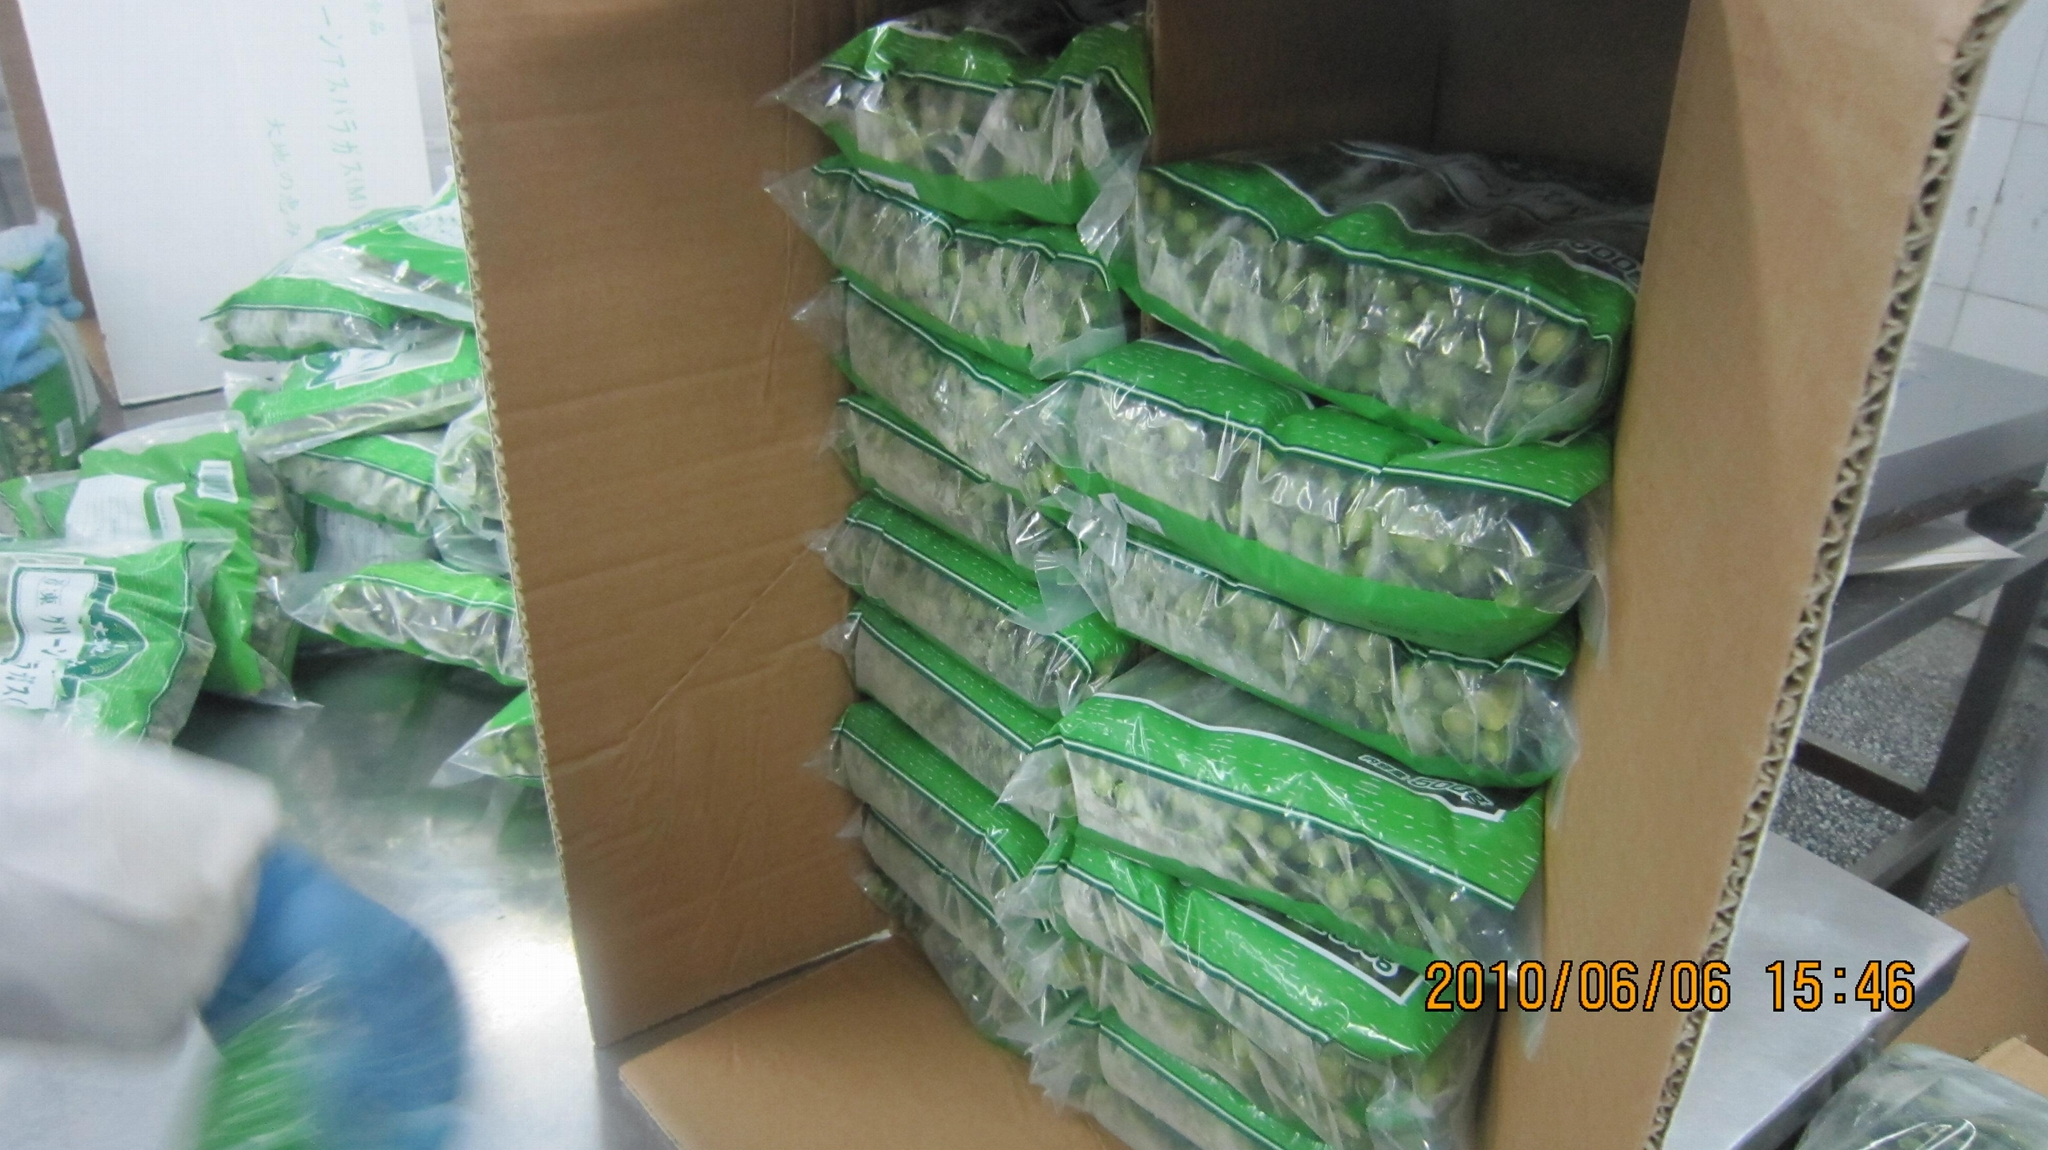 IQF Green Asparagus Cuts & Tips,Frozen Green Asparagus Tips & Cuts 16